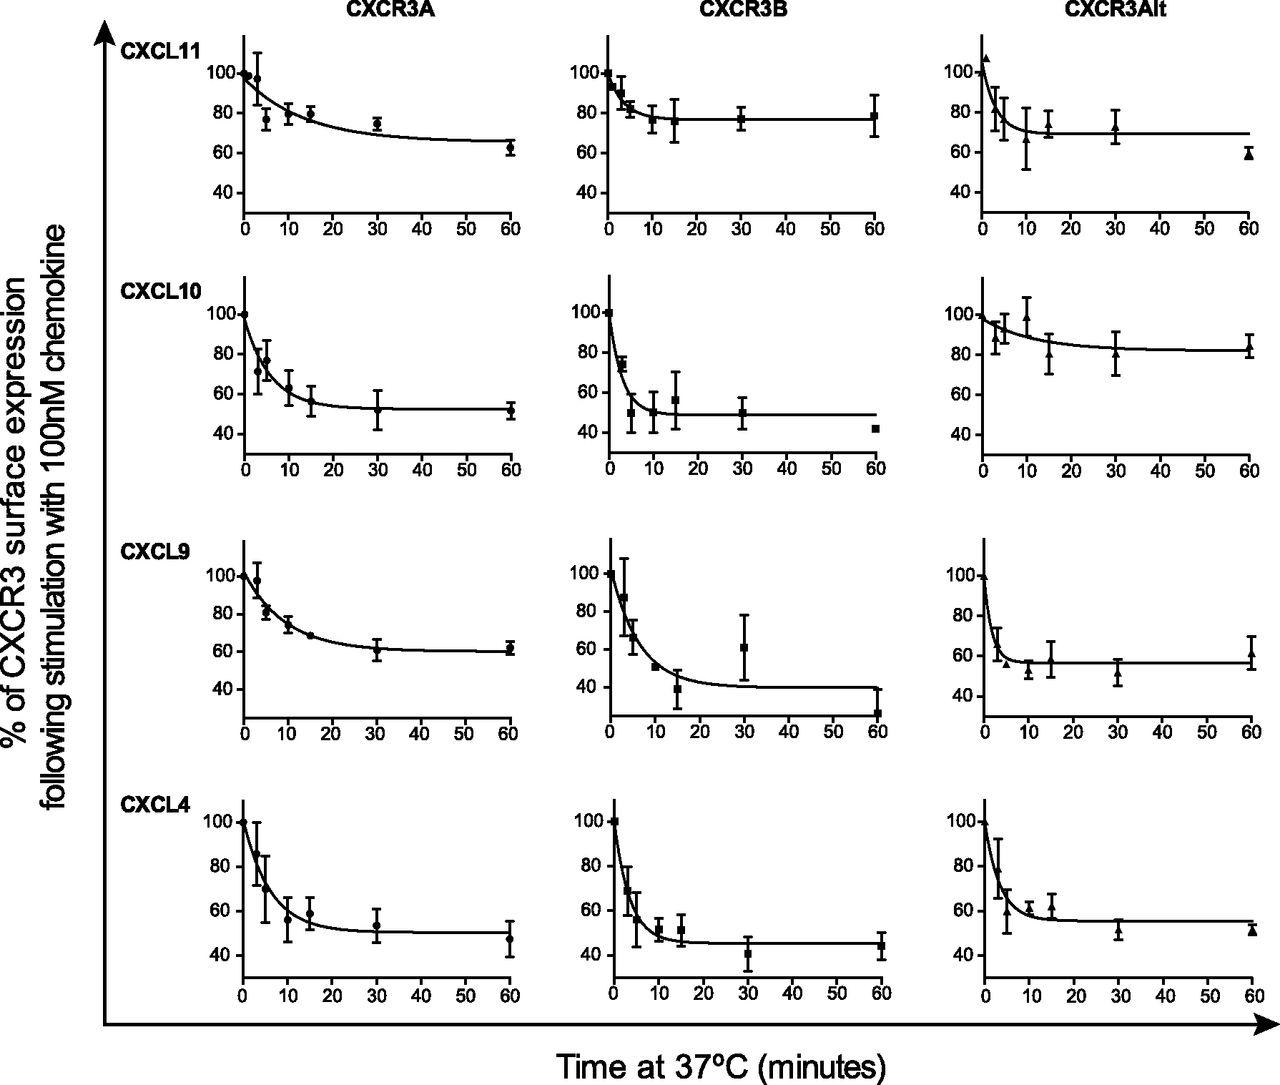 CXC Chemokine Receptor 3 Alternative Splice Variants